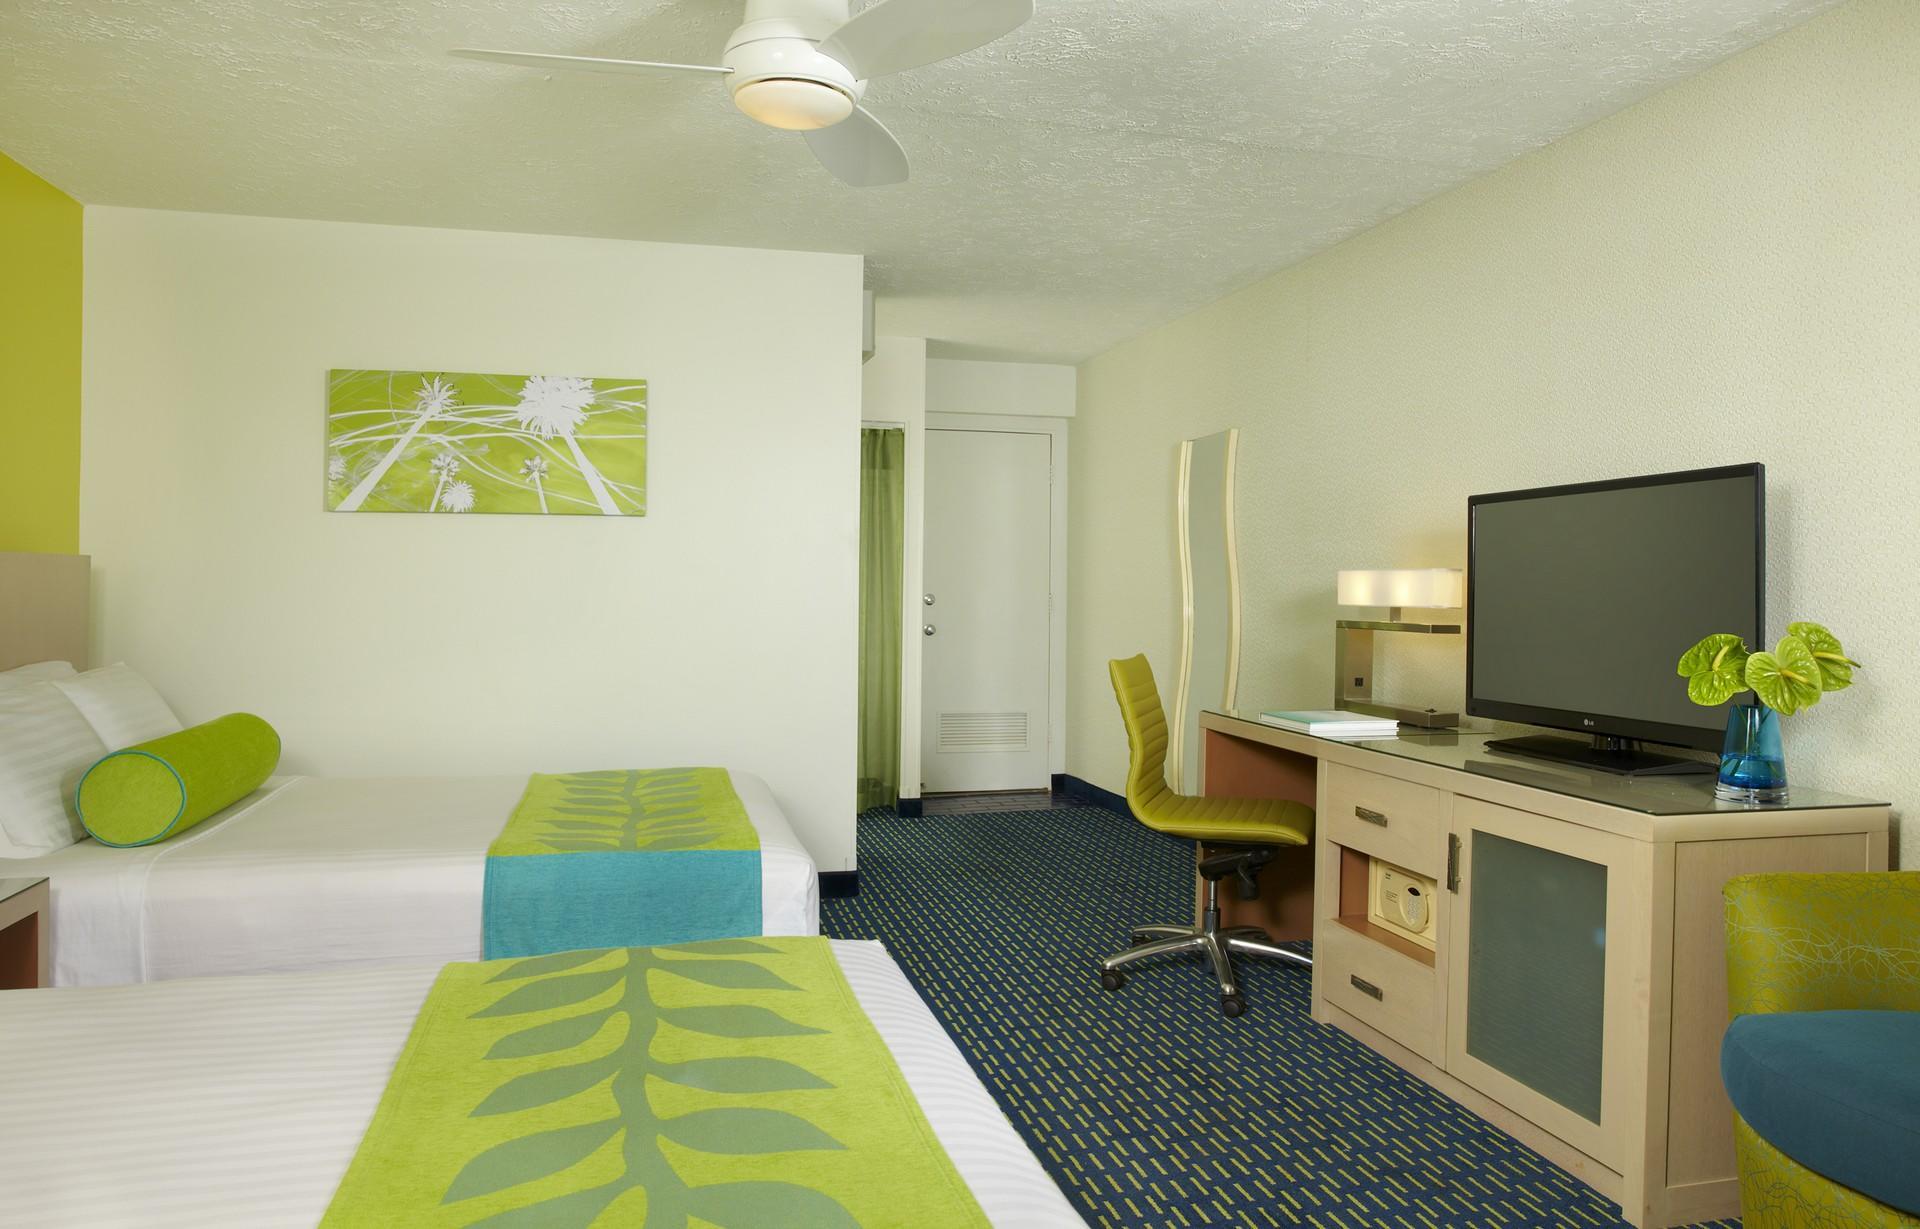 Kauai Shores Hotel image 8